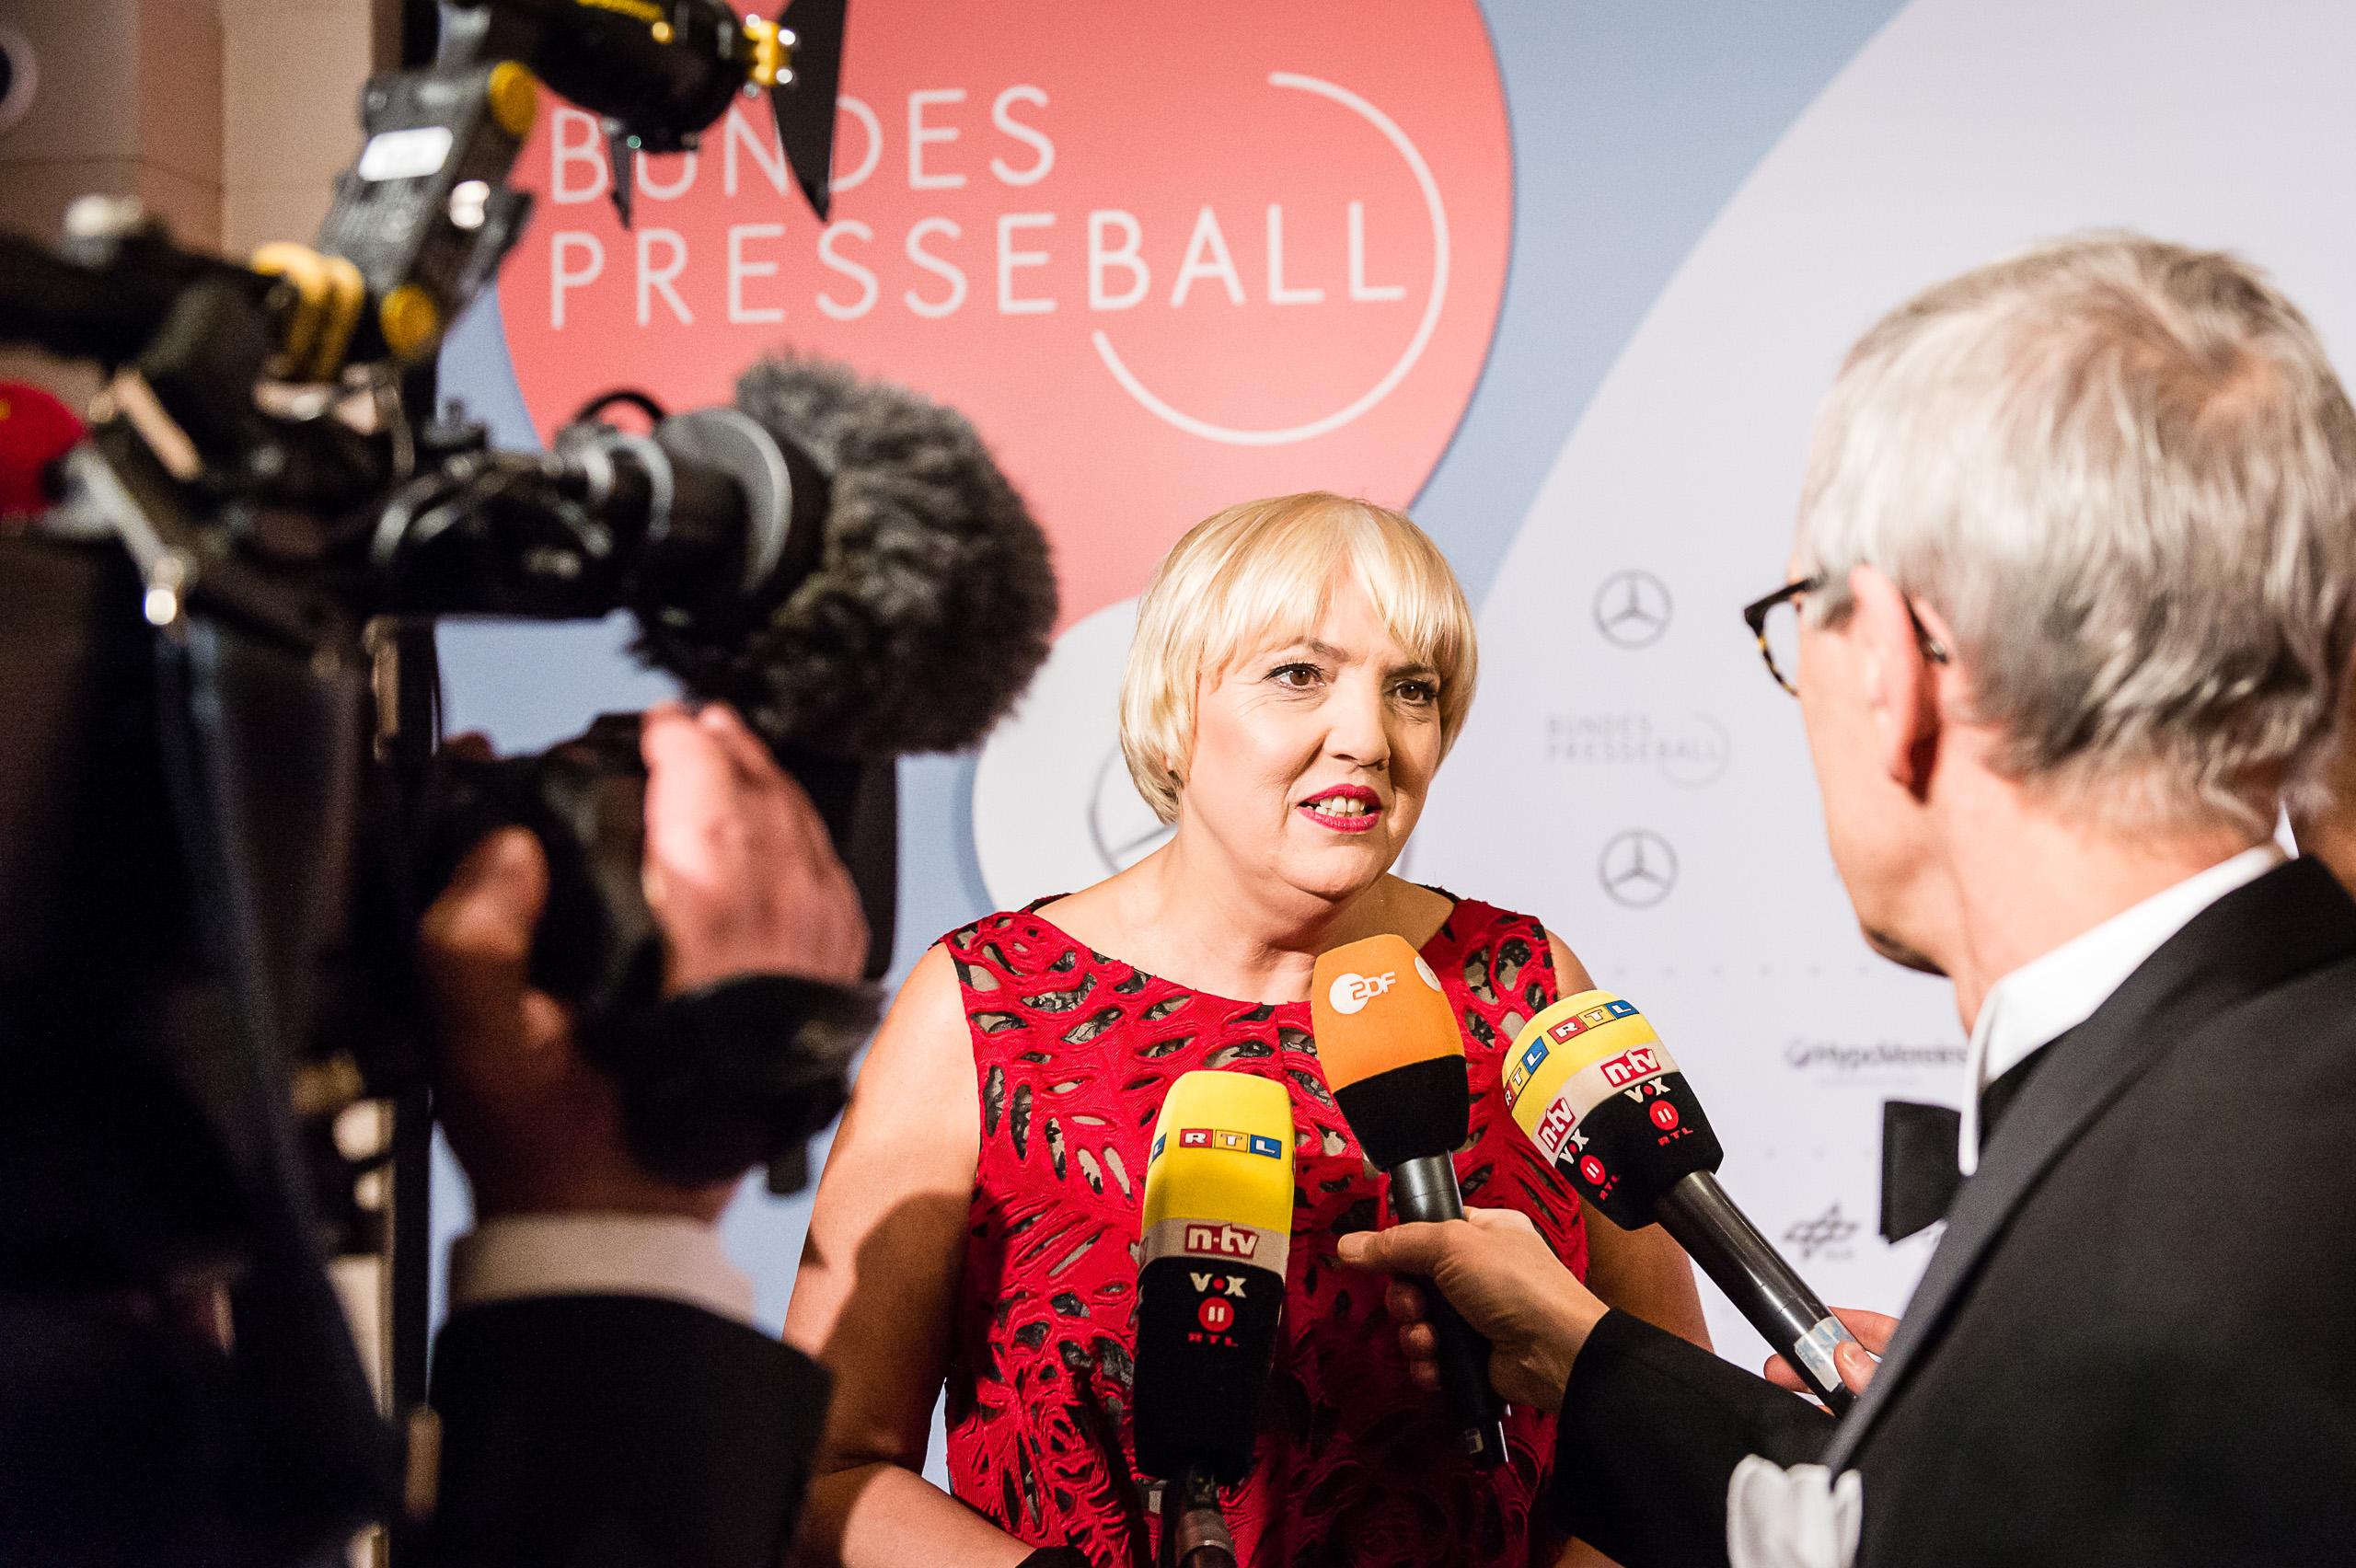 Bundespresseball 2016